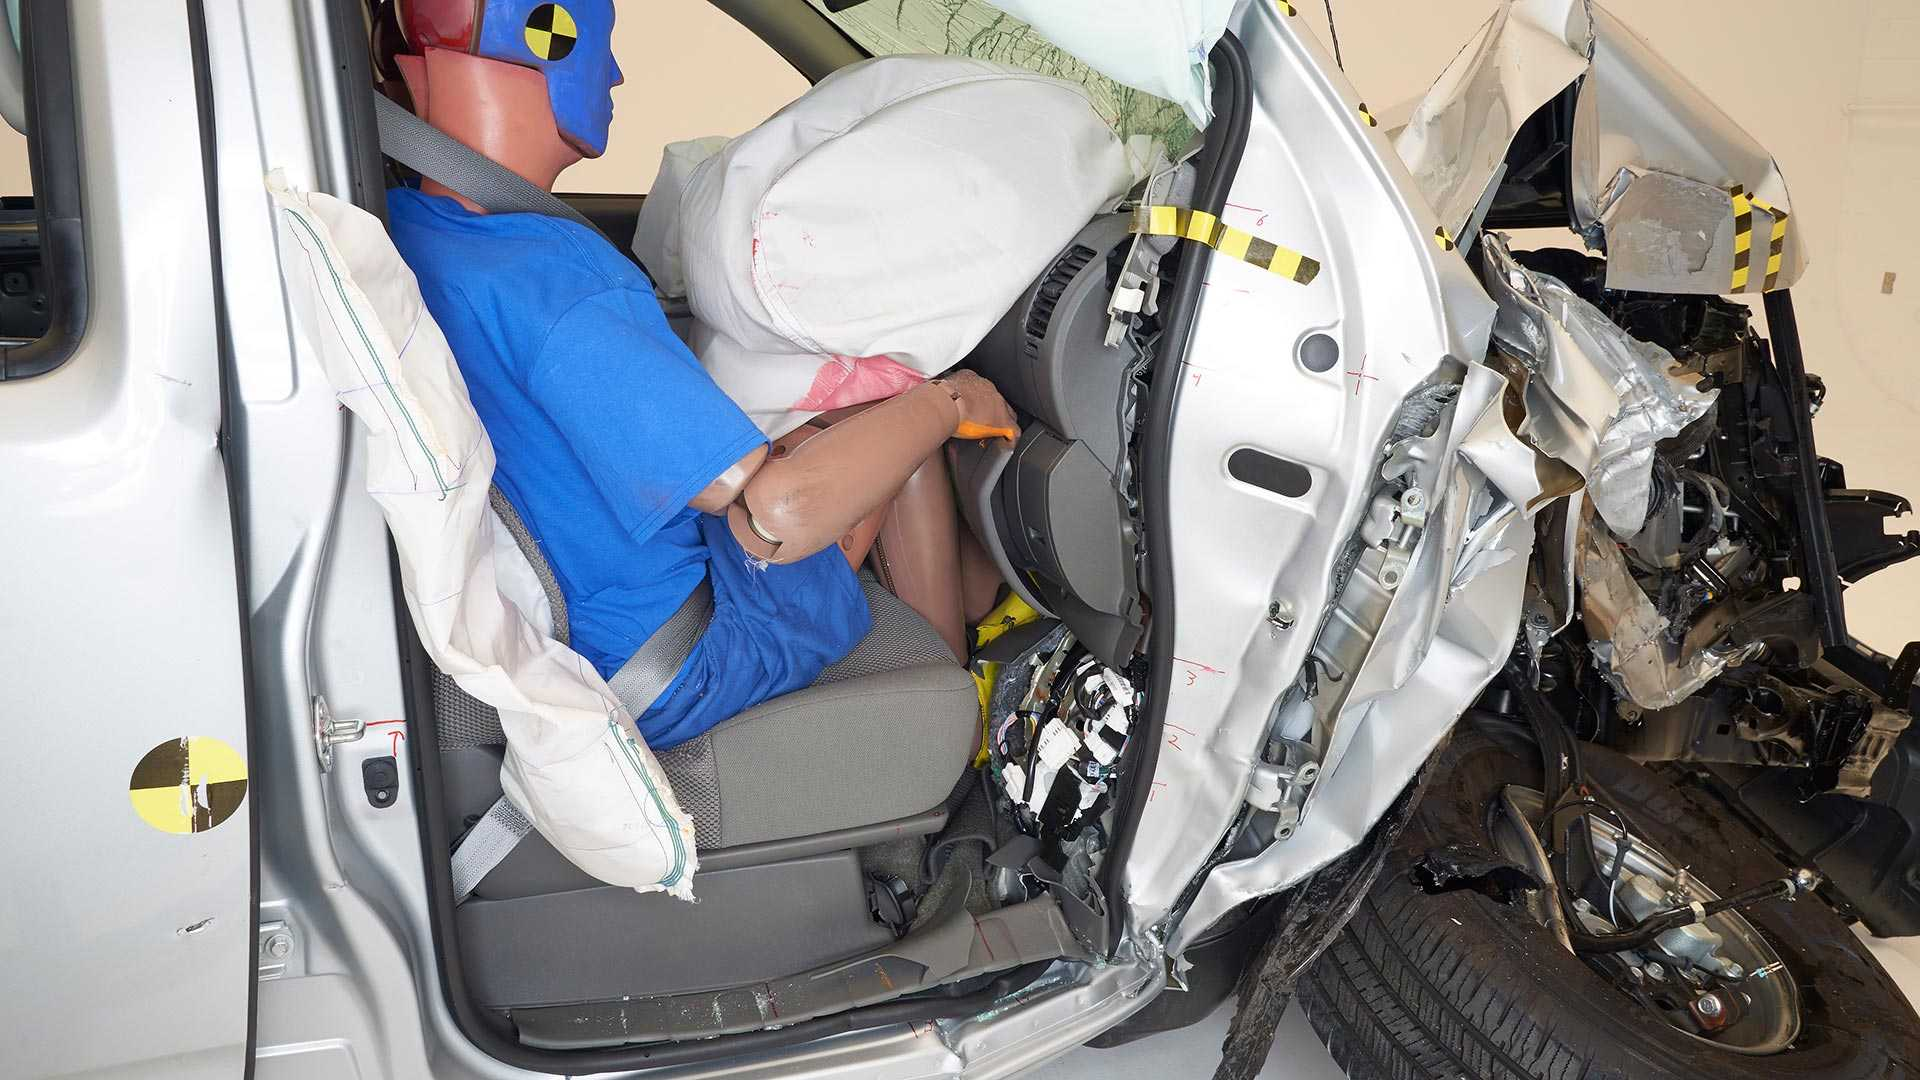 2019-nissan-frontier-crew-cab-crash-test (3)